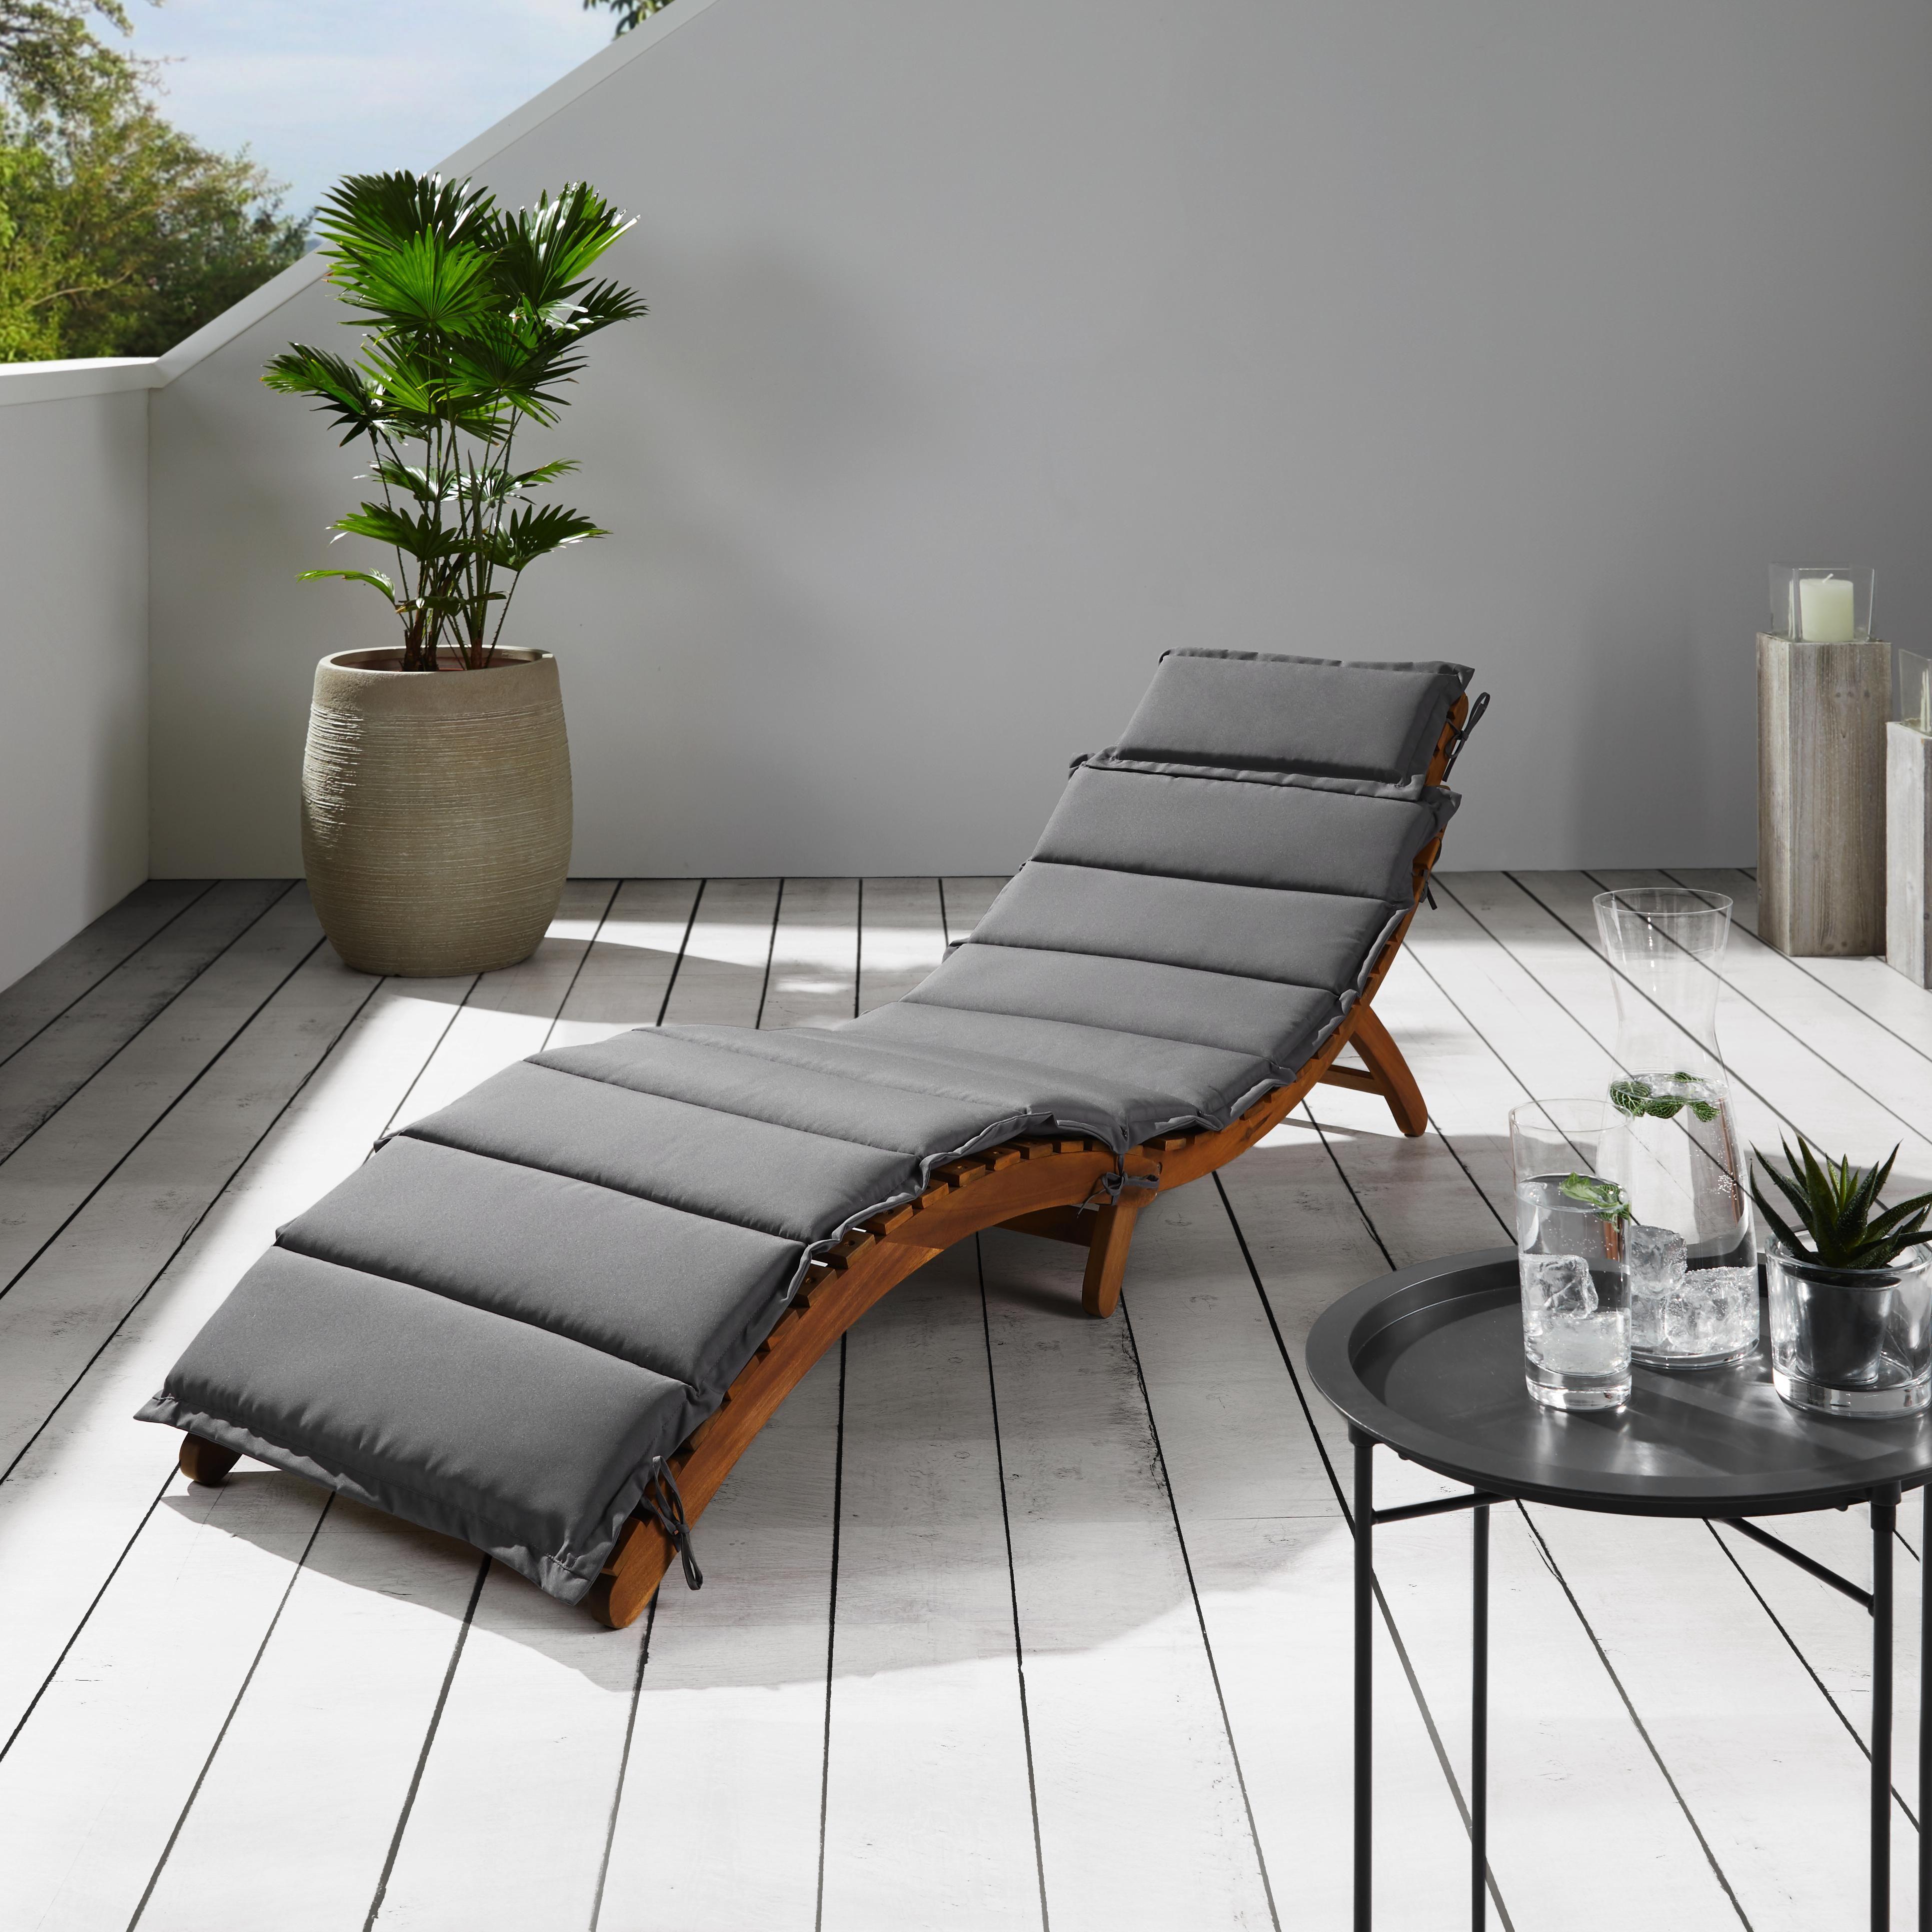 Gartenliege Bora aus Akazienholz inkl. Auflage - Dunkelgrau, MODERN, Holz/Textil (186/54/56cm) - Modern Living